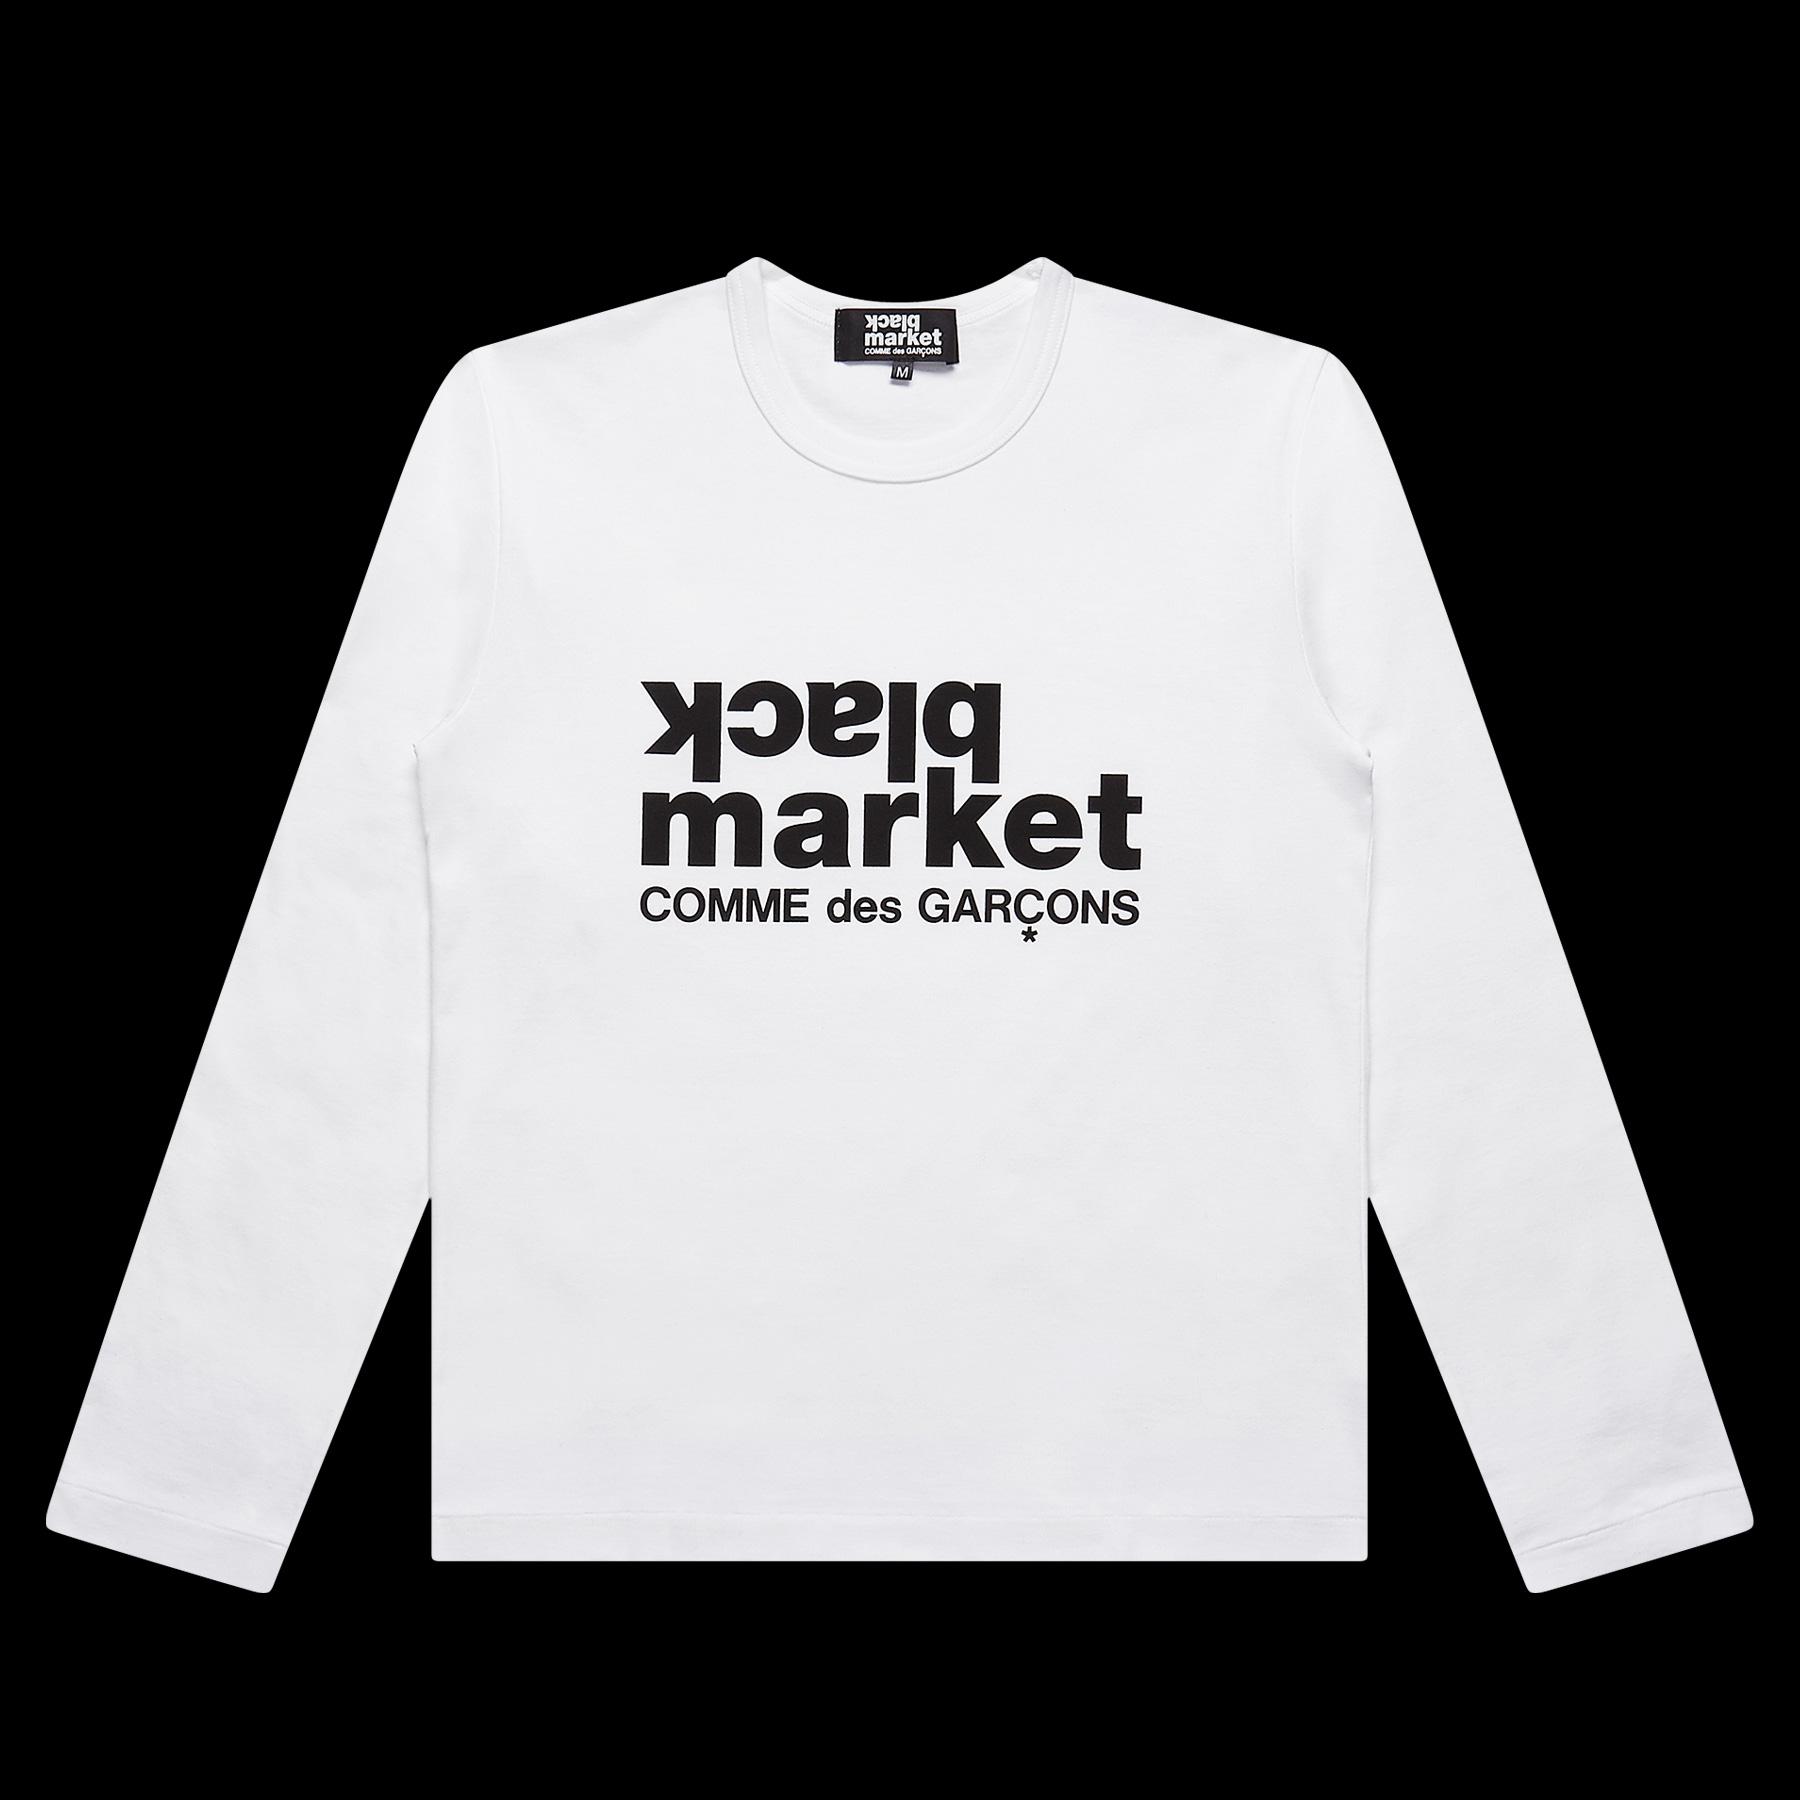 Black_Market_CDG_Event_T-Shirt_OD-T001-051_WHITE_F.jpg